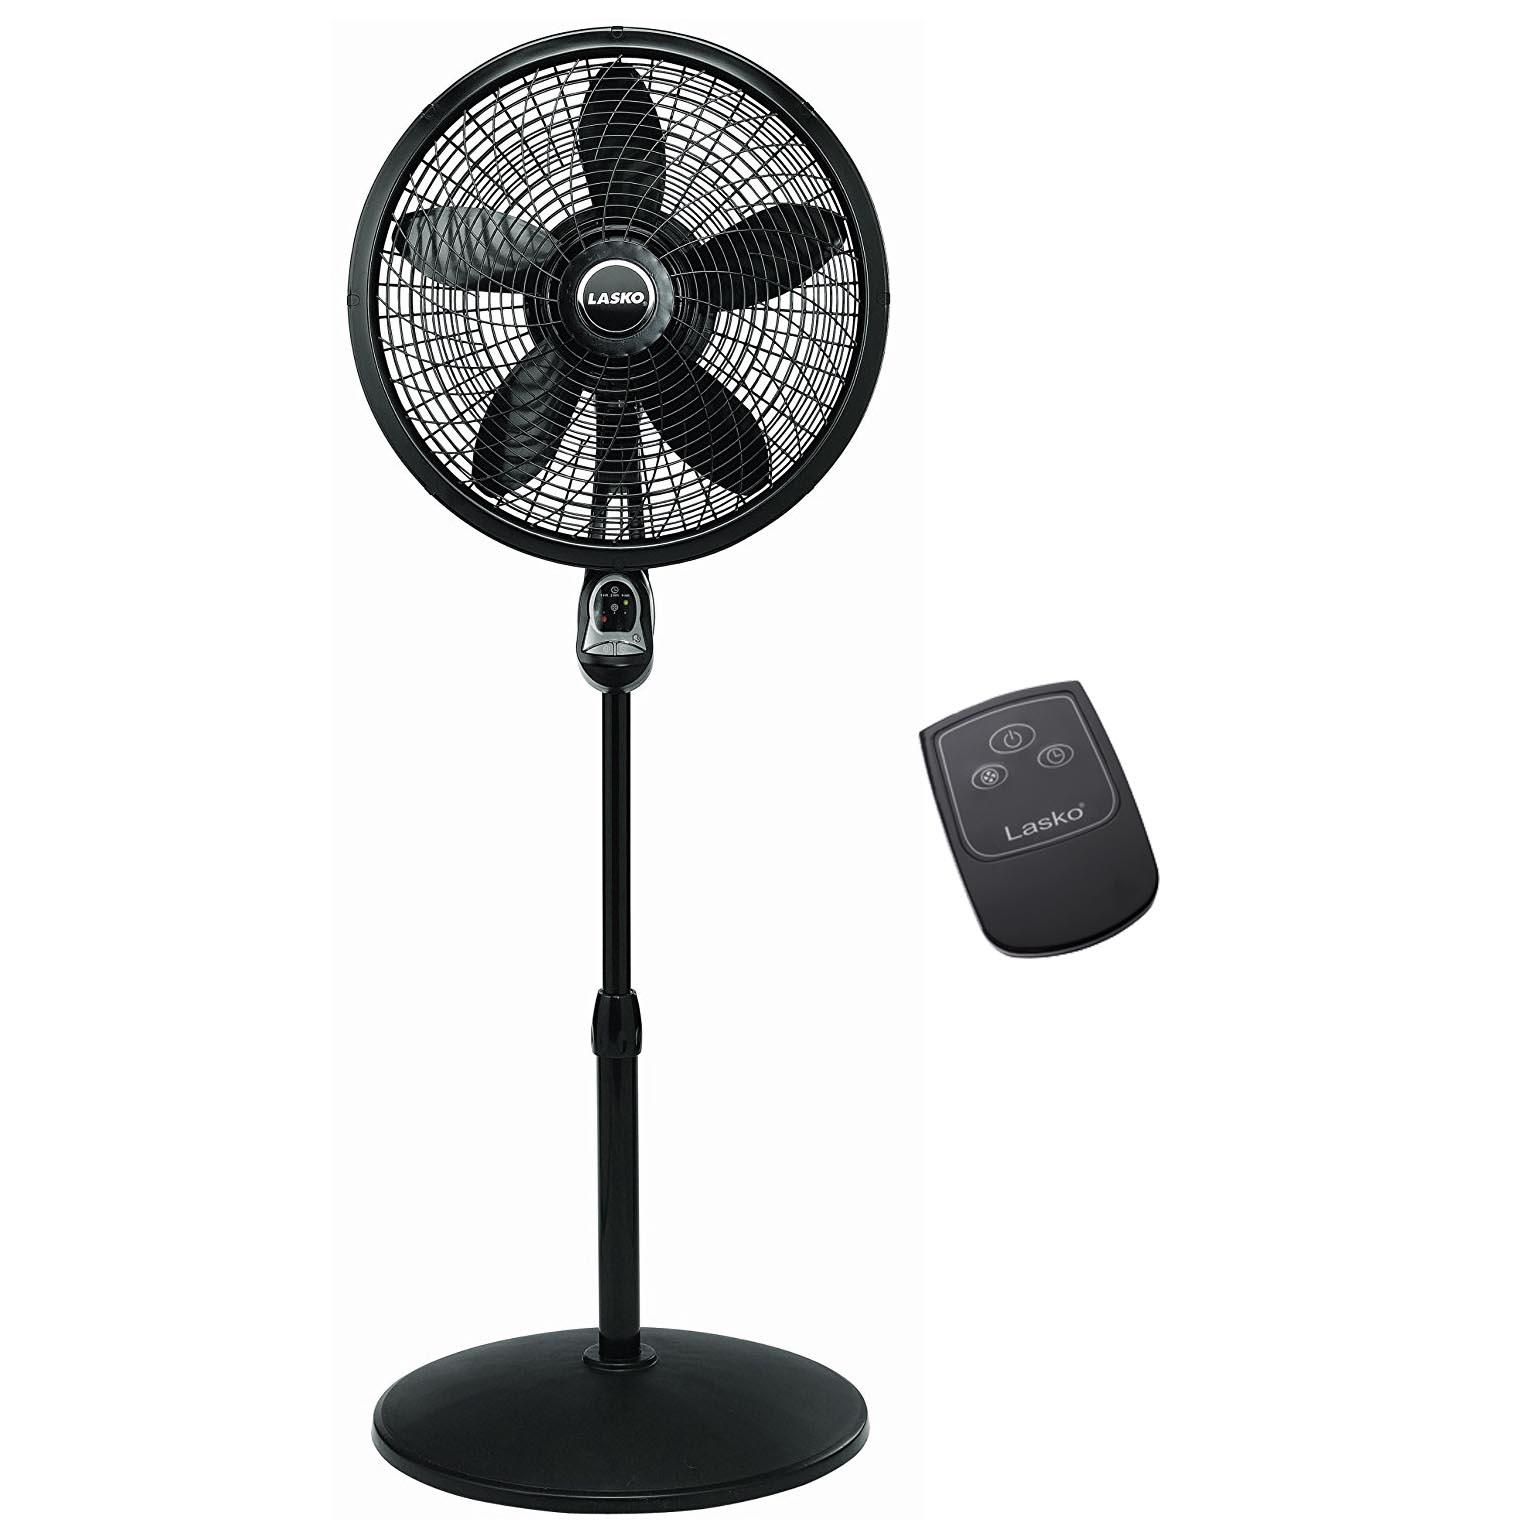 Oscillating Stand Fan : Lasko inch oscillating cyclone pedestal stand fan w